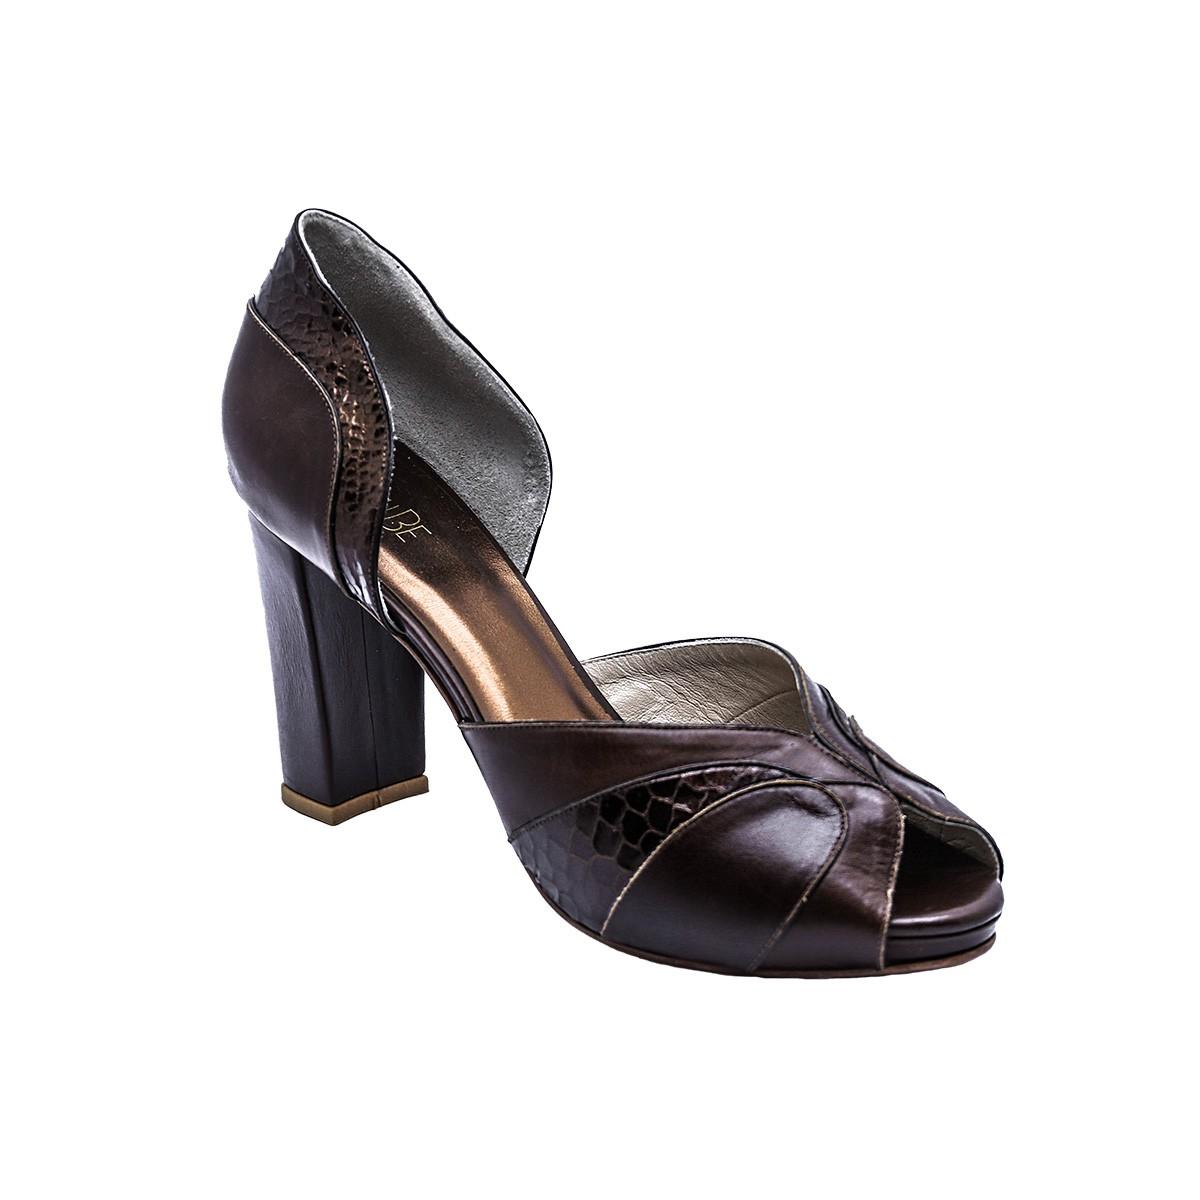 Sapato Paula Pelica Marrom 8 cm